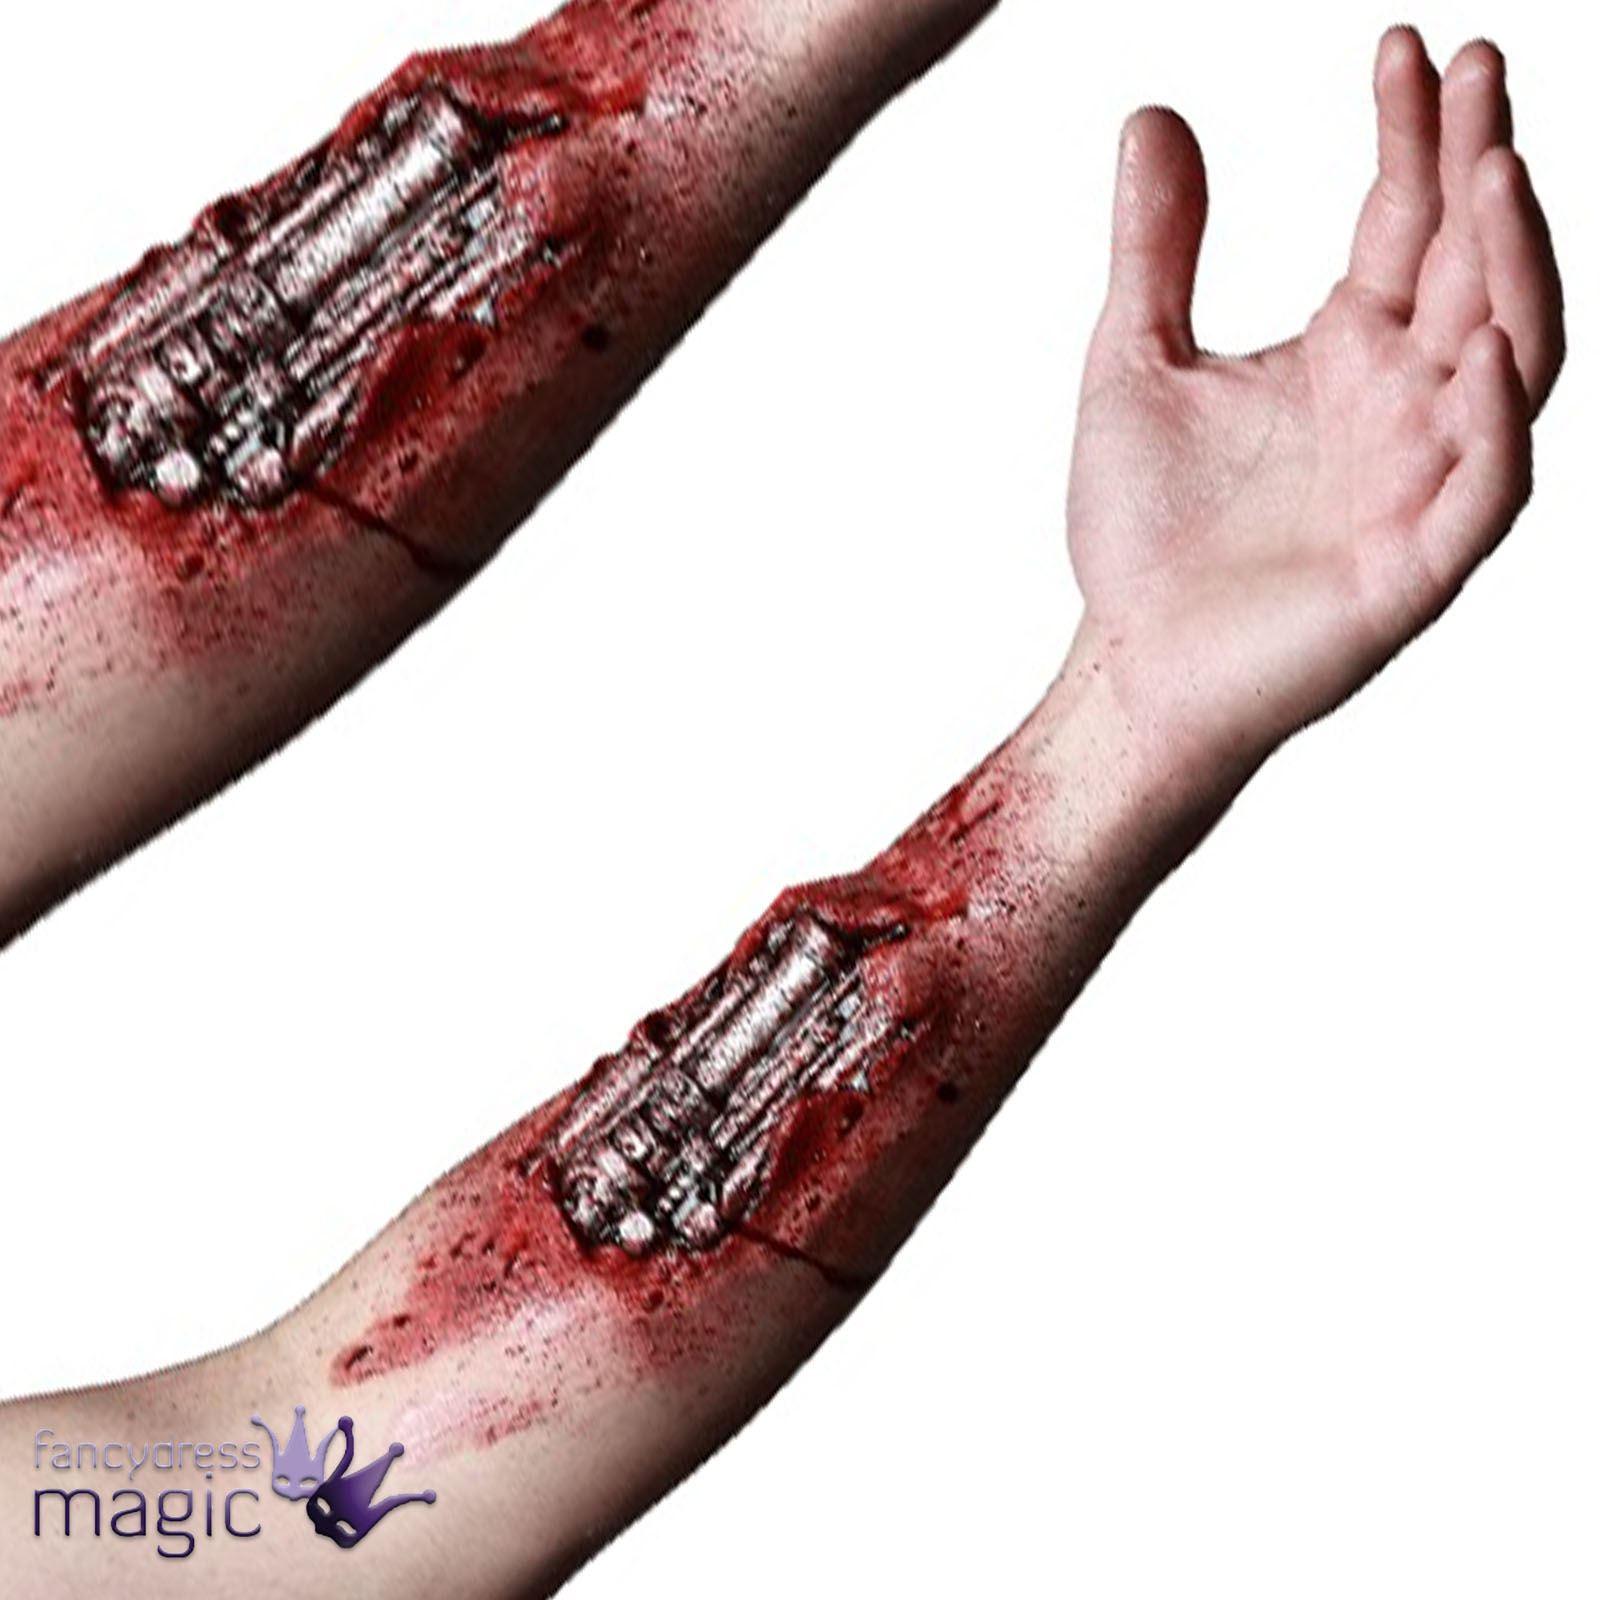 Monster High Ebay >> Terminator Genisys Cyborg Robot Fancy Dress Latex Arm Prosthetic Wound Appliance 886390107037   eBay